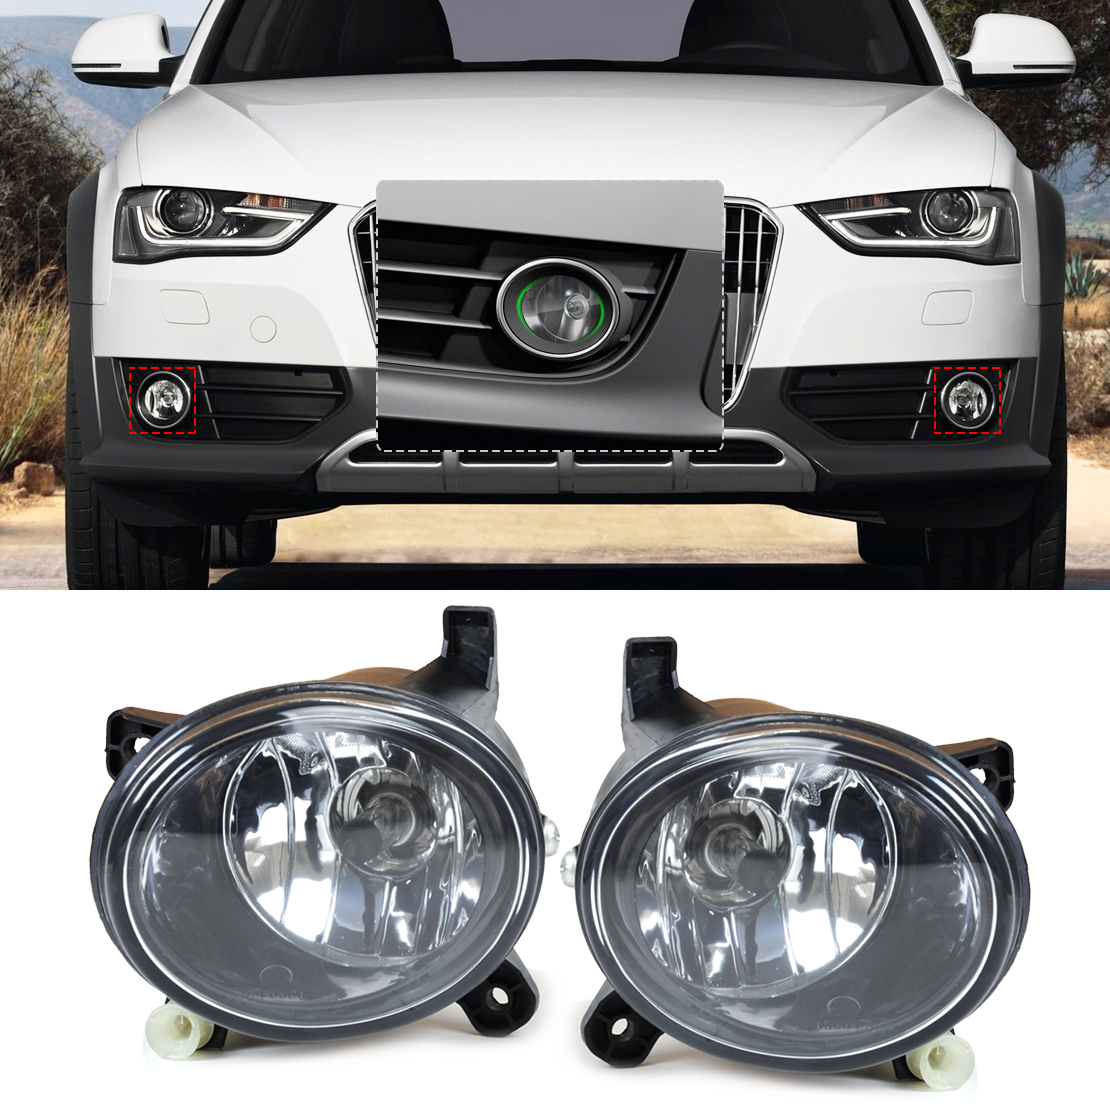 DWCX 8T0941699B, 8T0941700B Front Right Left Fog Light Lamp for for Audi A4 B8 / S4 / A4 Allroad / A6 C6 / S6 / A5 / S5 / Q5 новый стартерный двигатель oem 0001108174 для vw passat audi a4 a6 allroad quattro s4 t